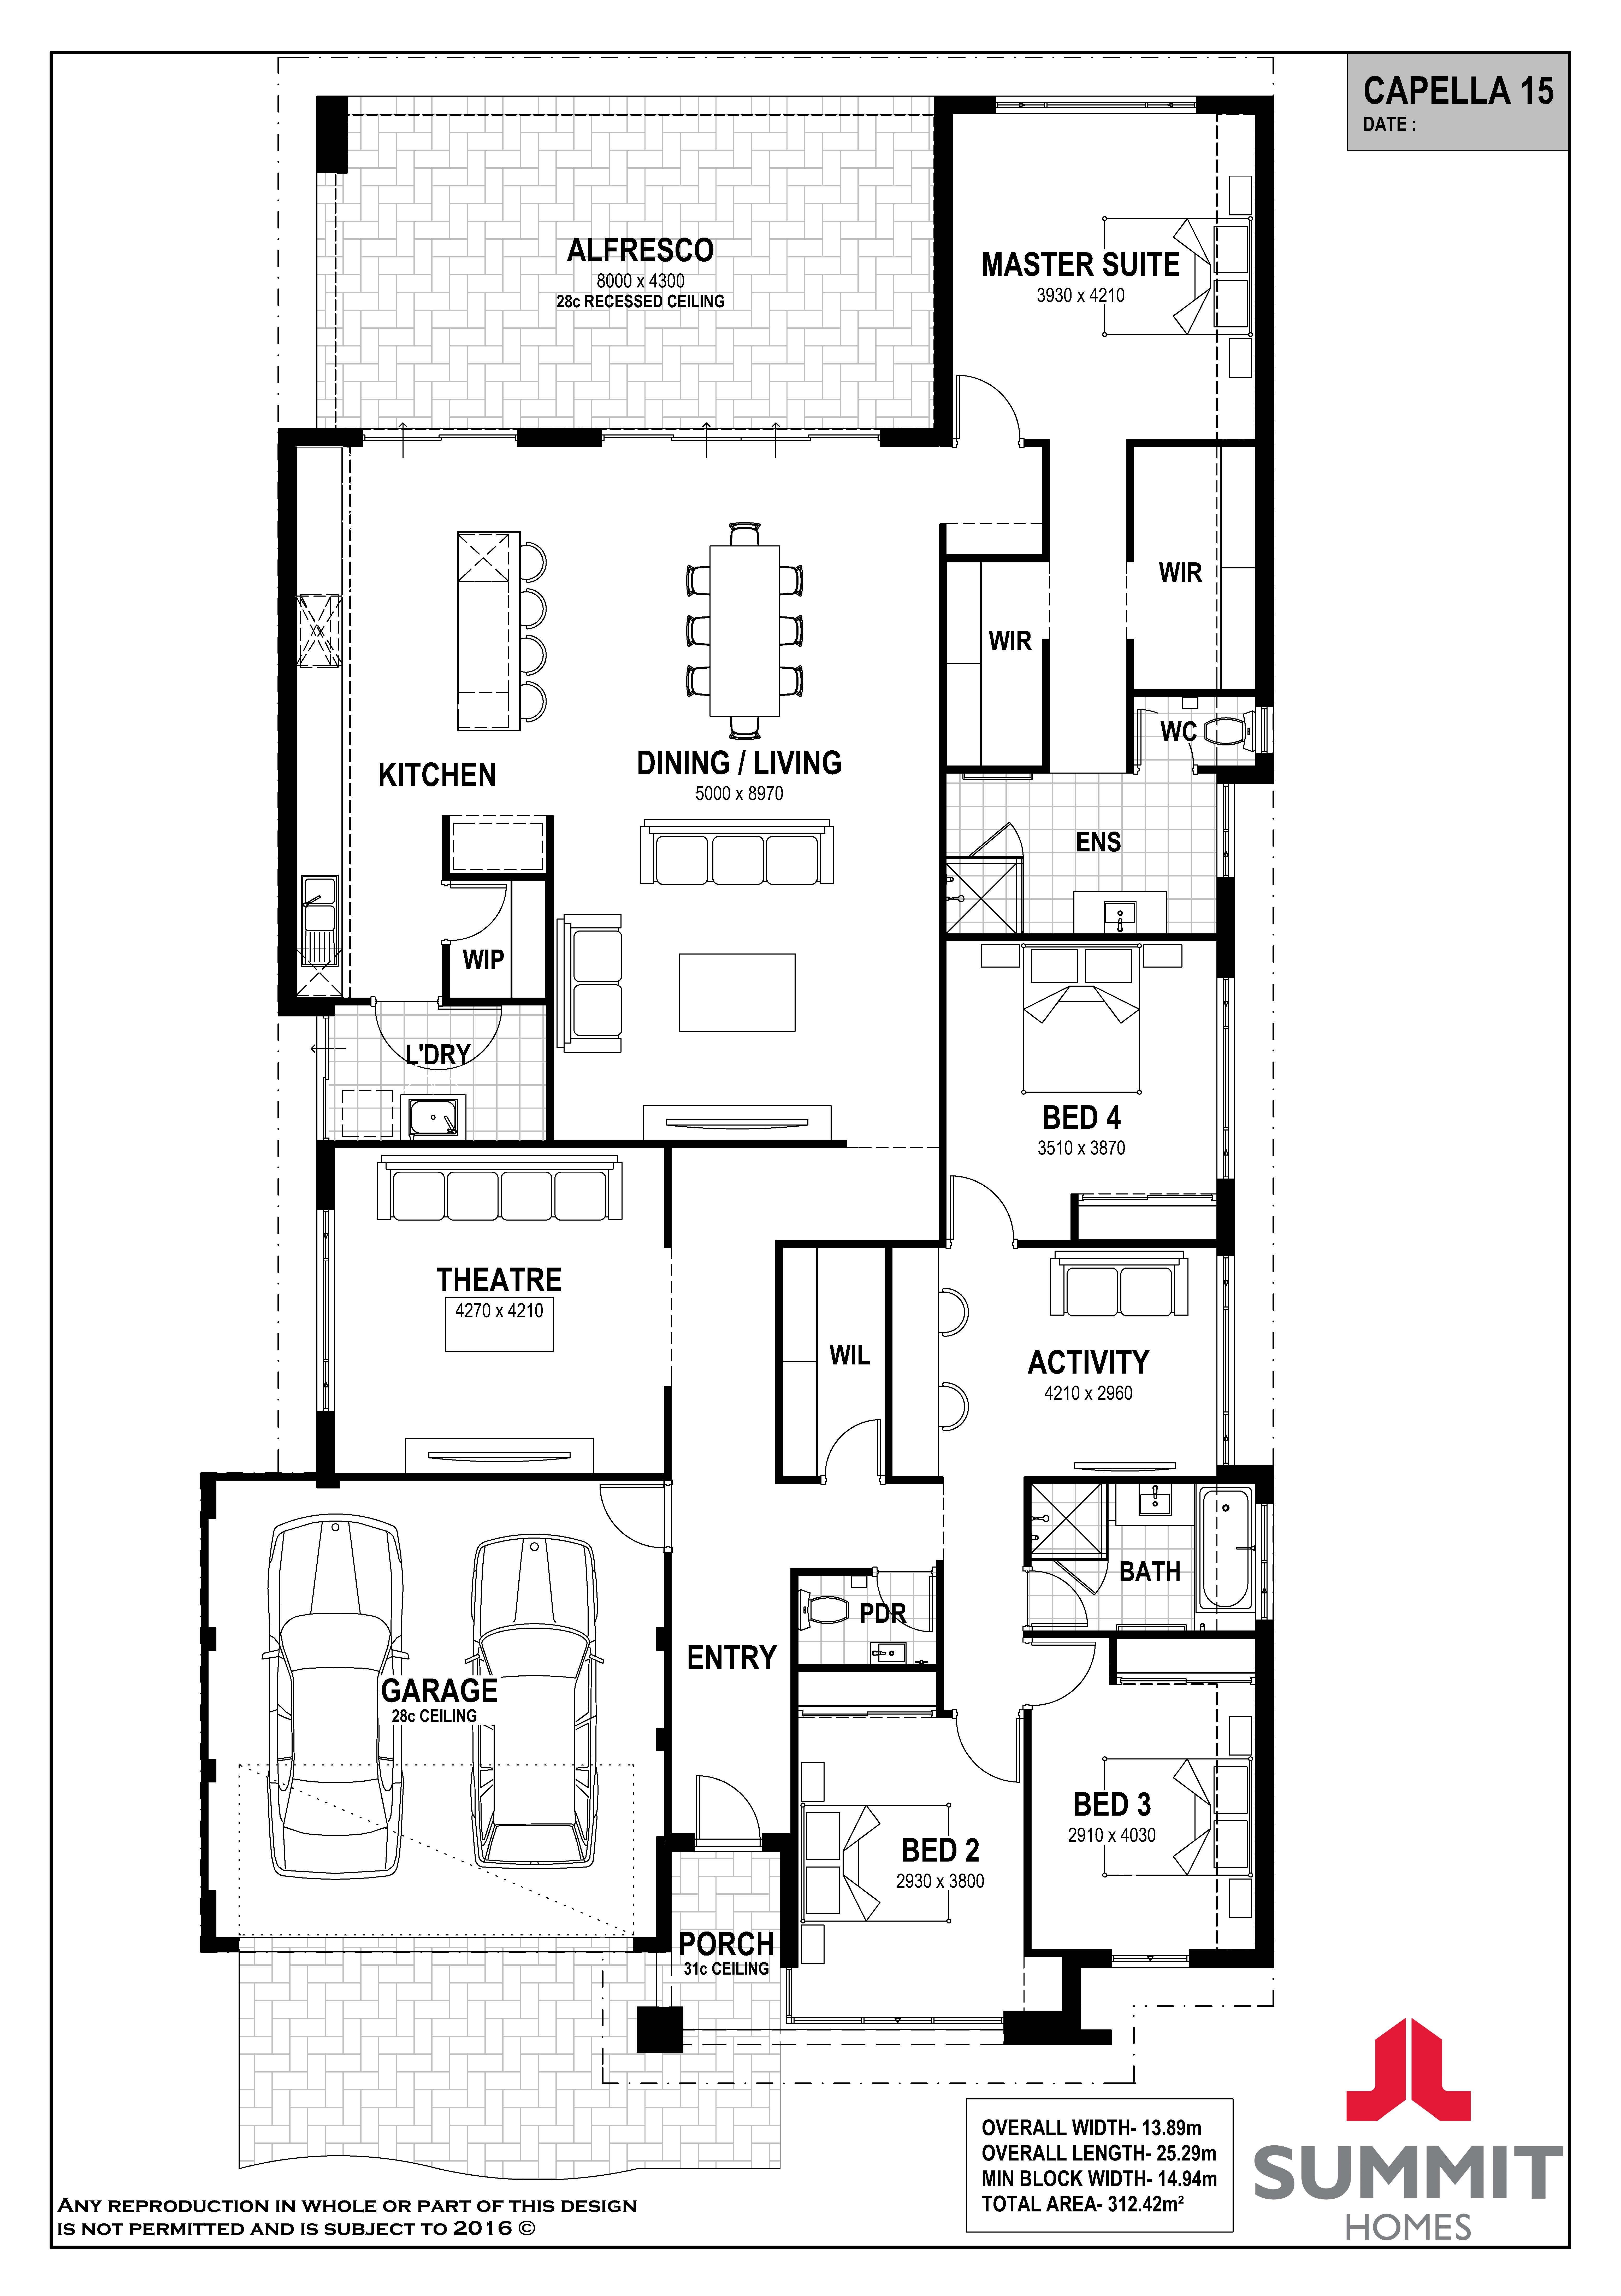 Capella15fpg 6 2108 794 pinterest house design crossword capella15fpg 6 2108 794 malvernweather Choice Image